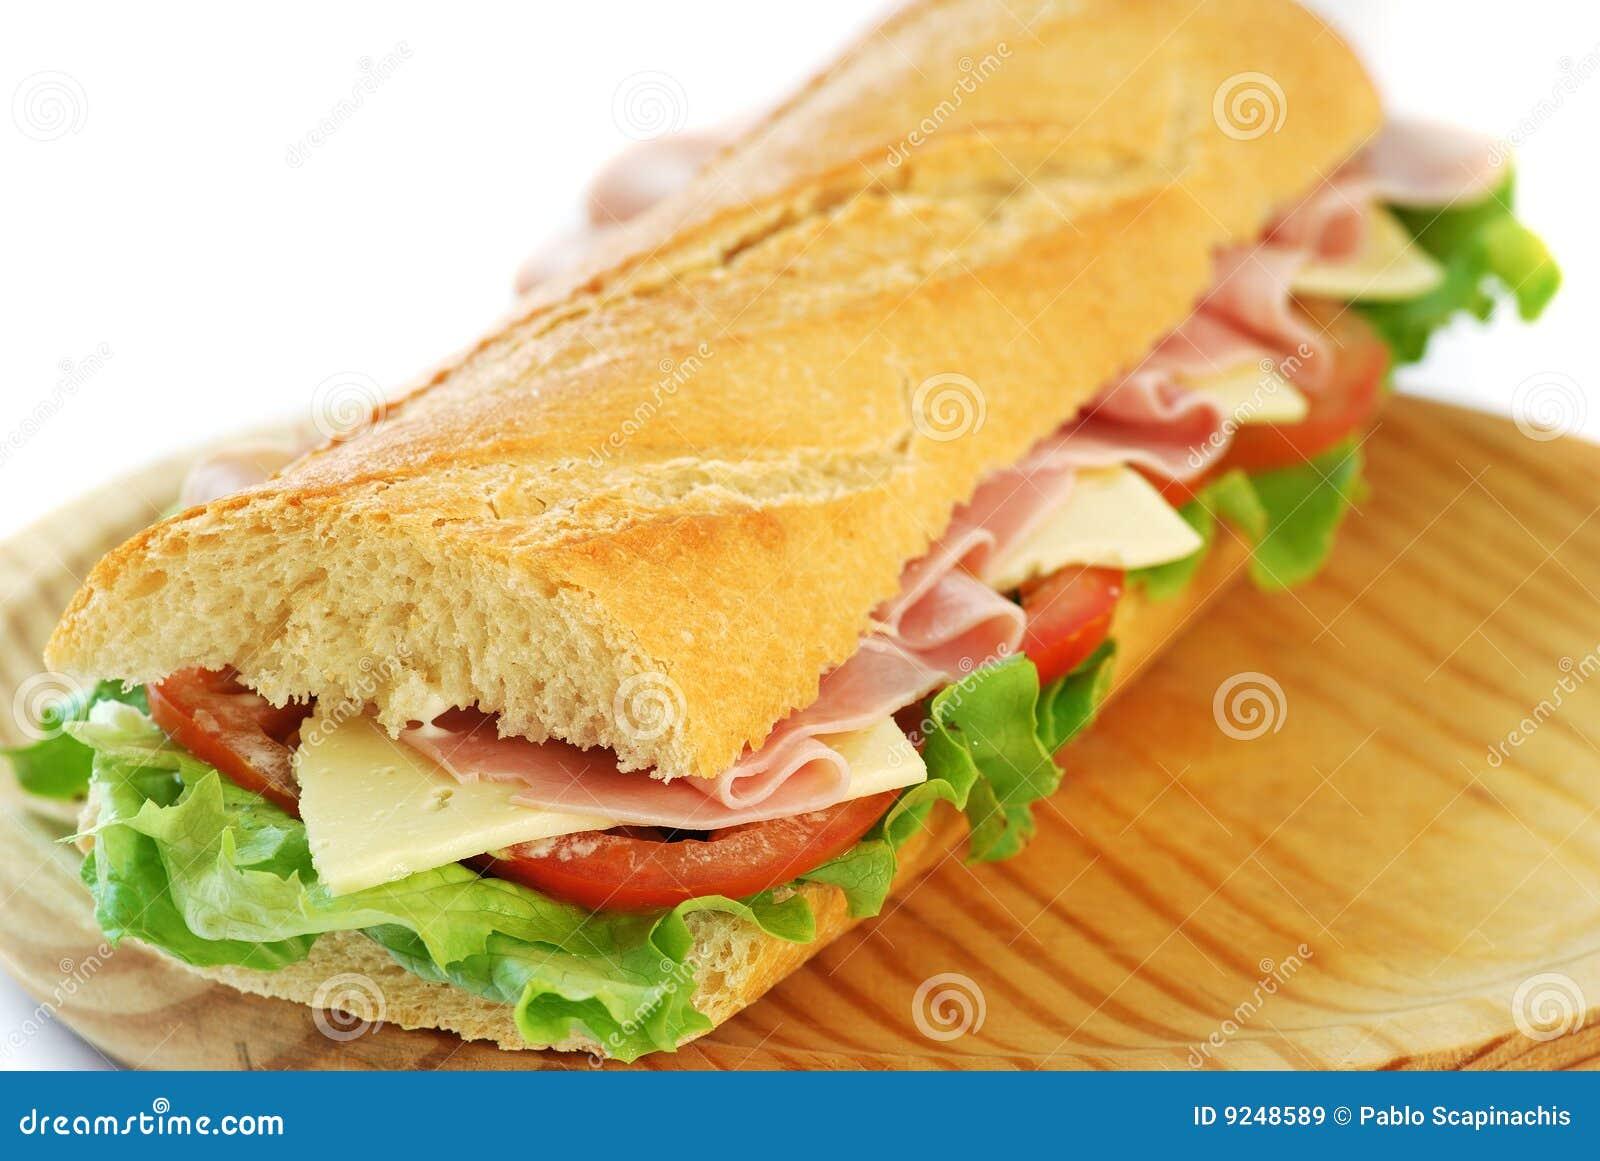 Sanduíche do Baguette com presunto e queijo